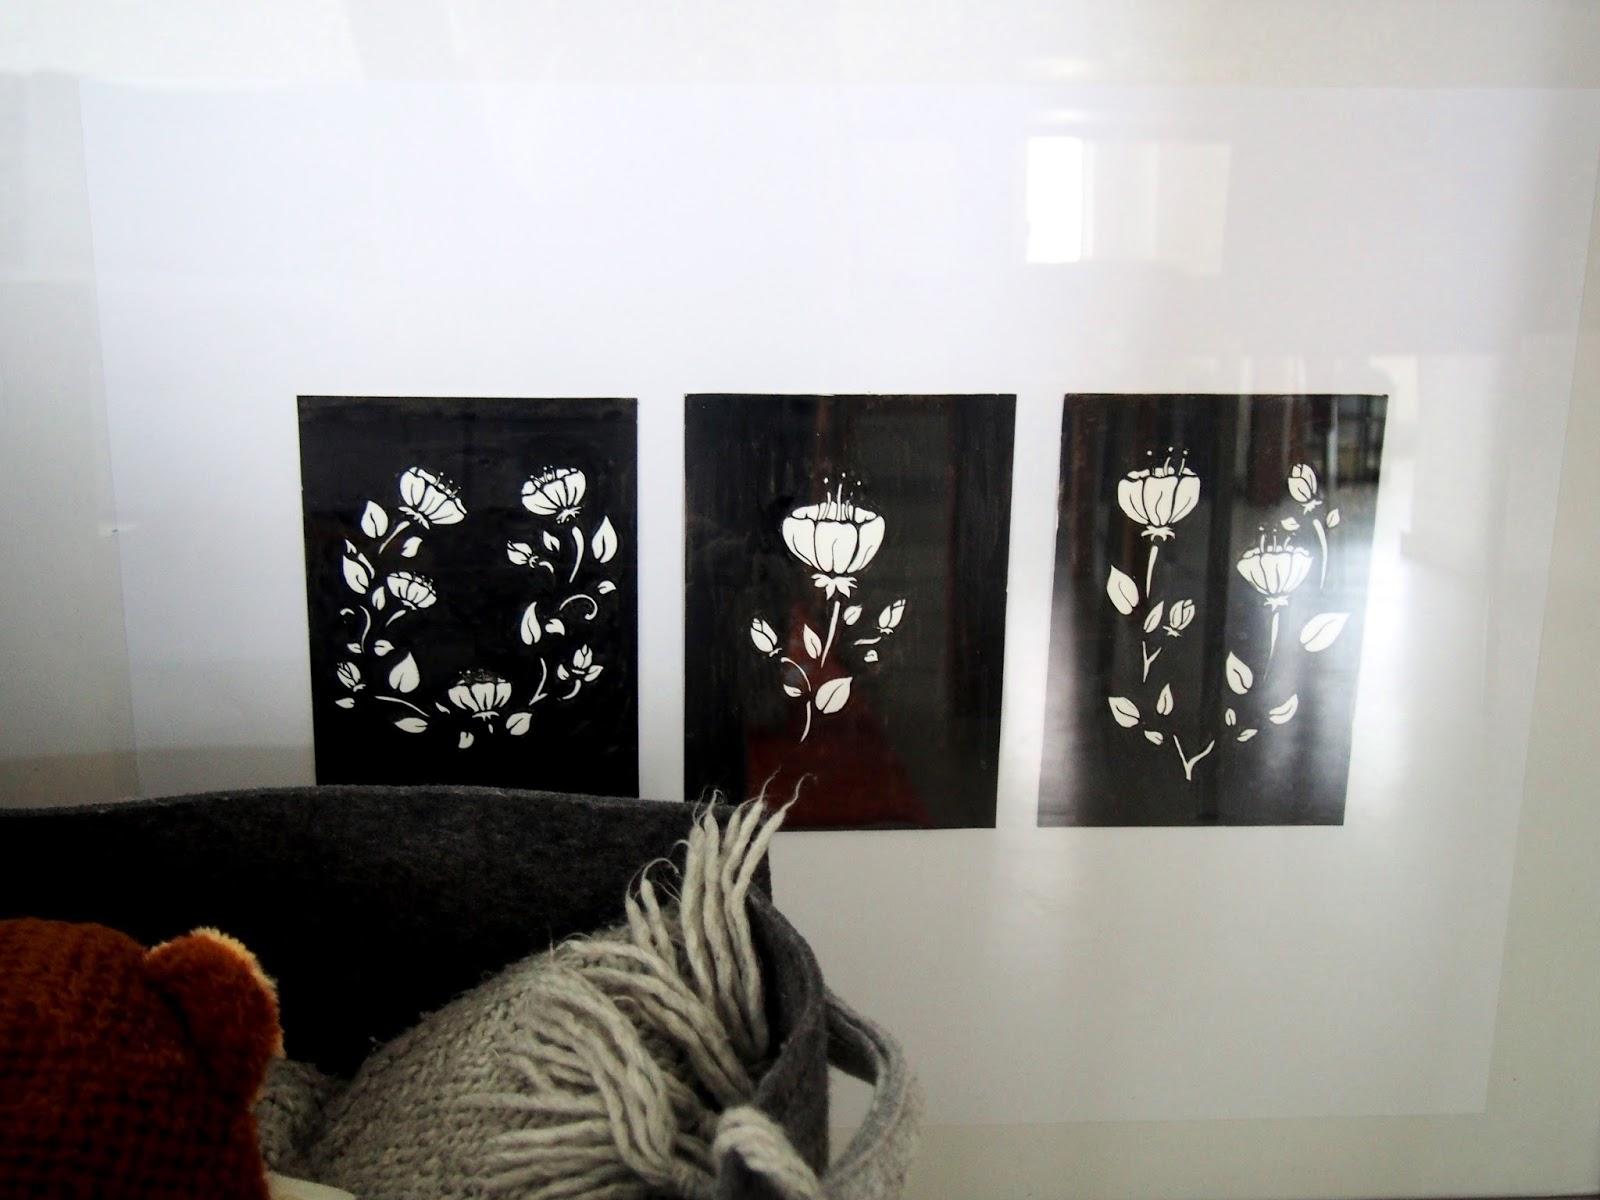 art homemade diy itse tehty taide maalaus calligraphy kalligrafia muste ink